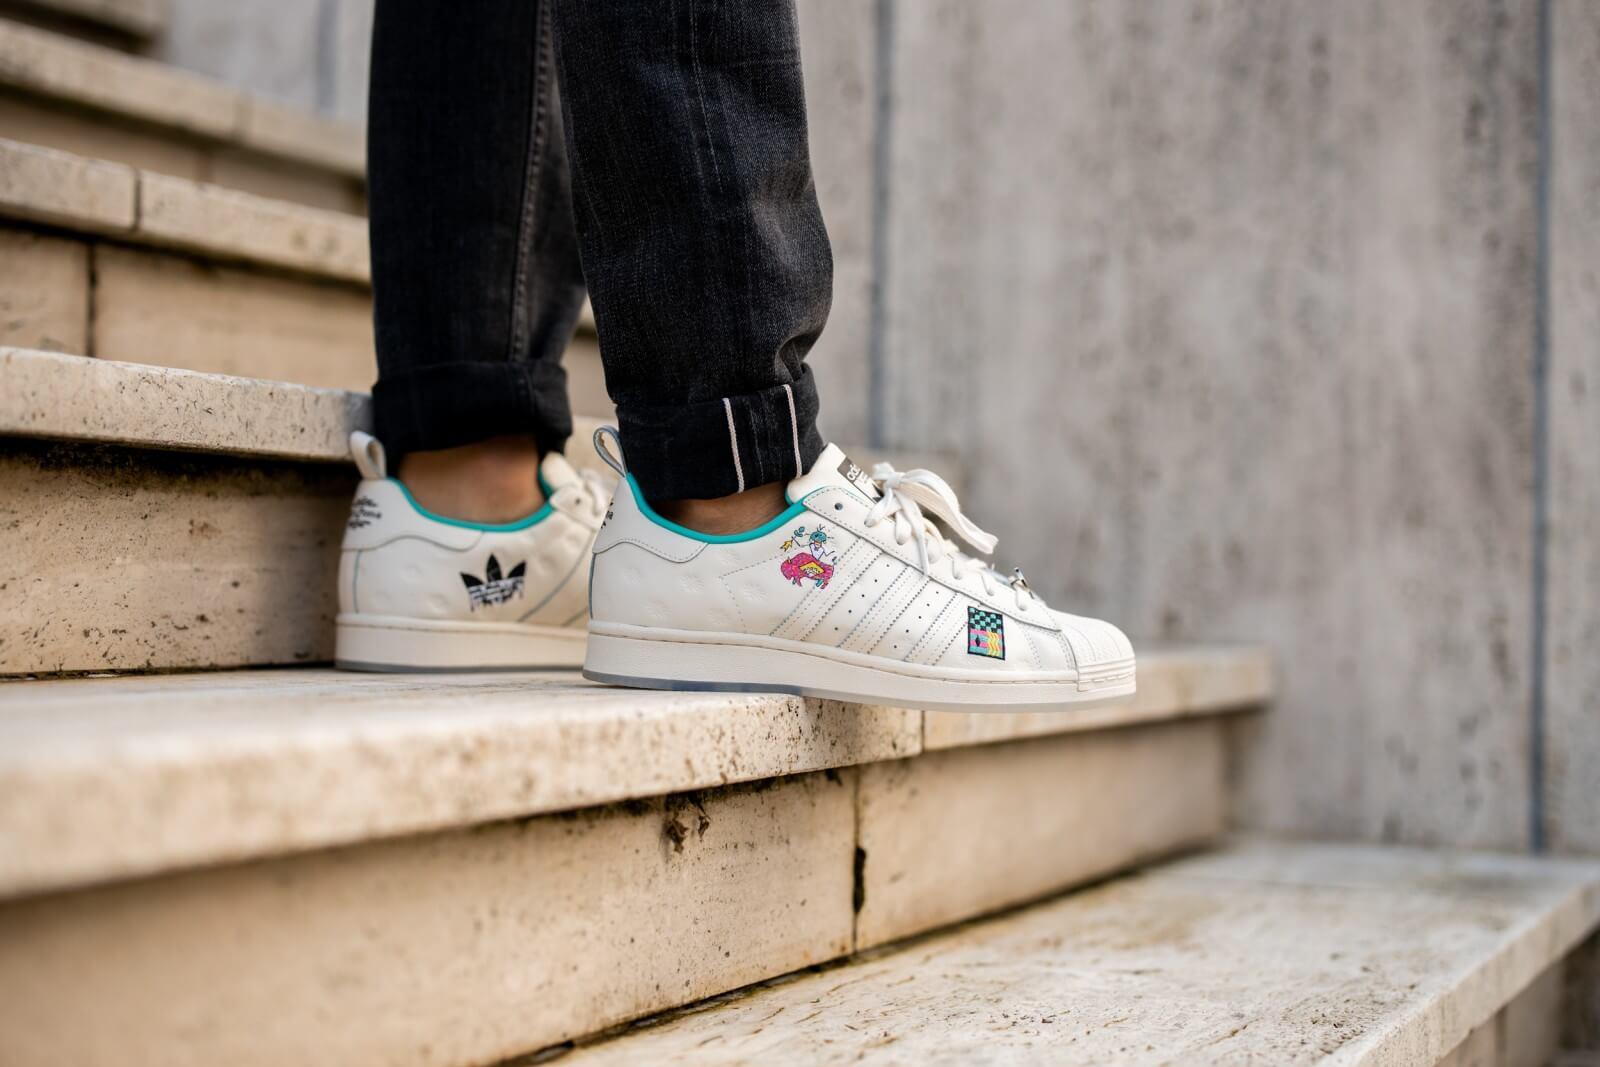 Adidas x Arizona Iced Tea Superstar Teal/Chalk White